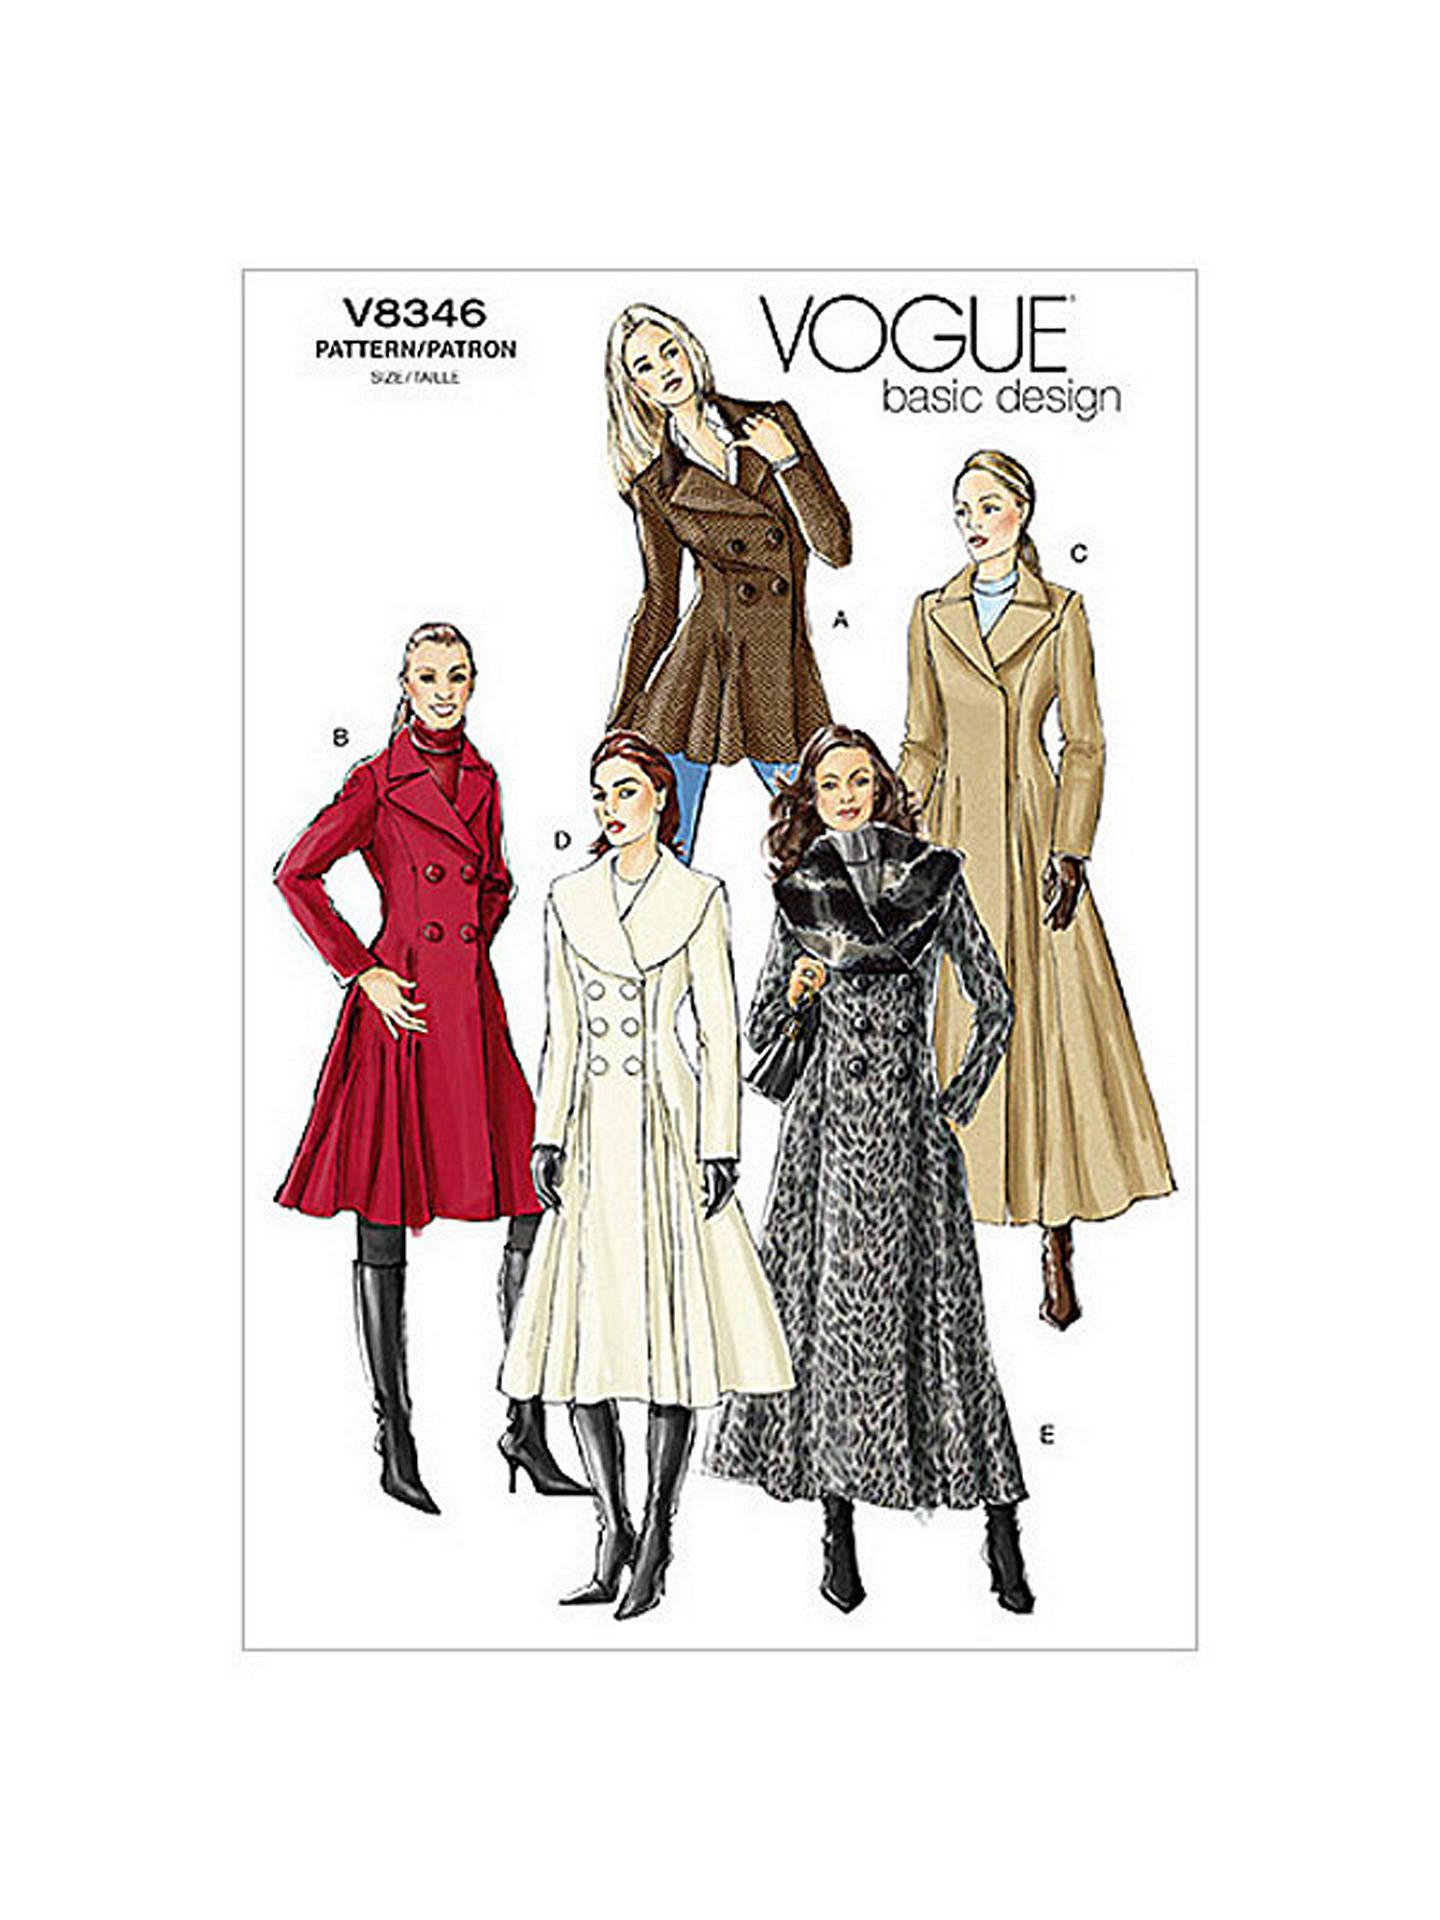 Vogue Women\'s Coats Sewing Pattern, 8346 at John Lewis & Partners